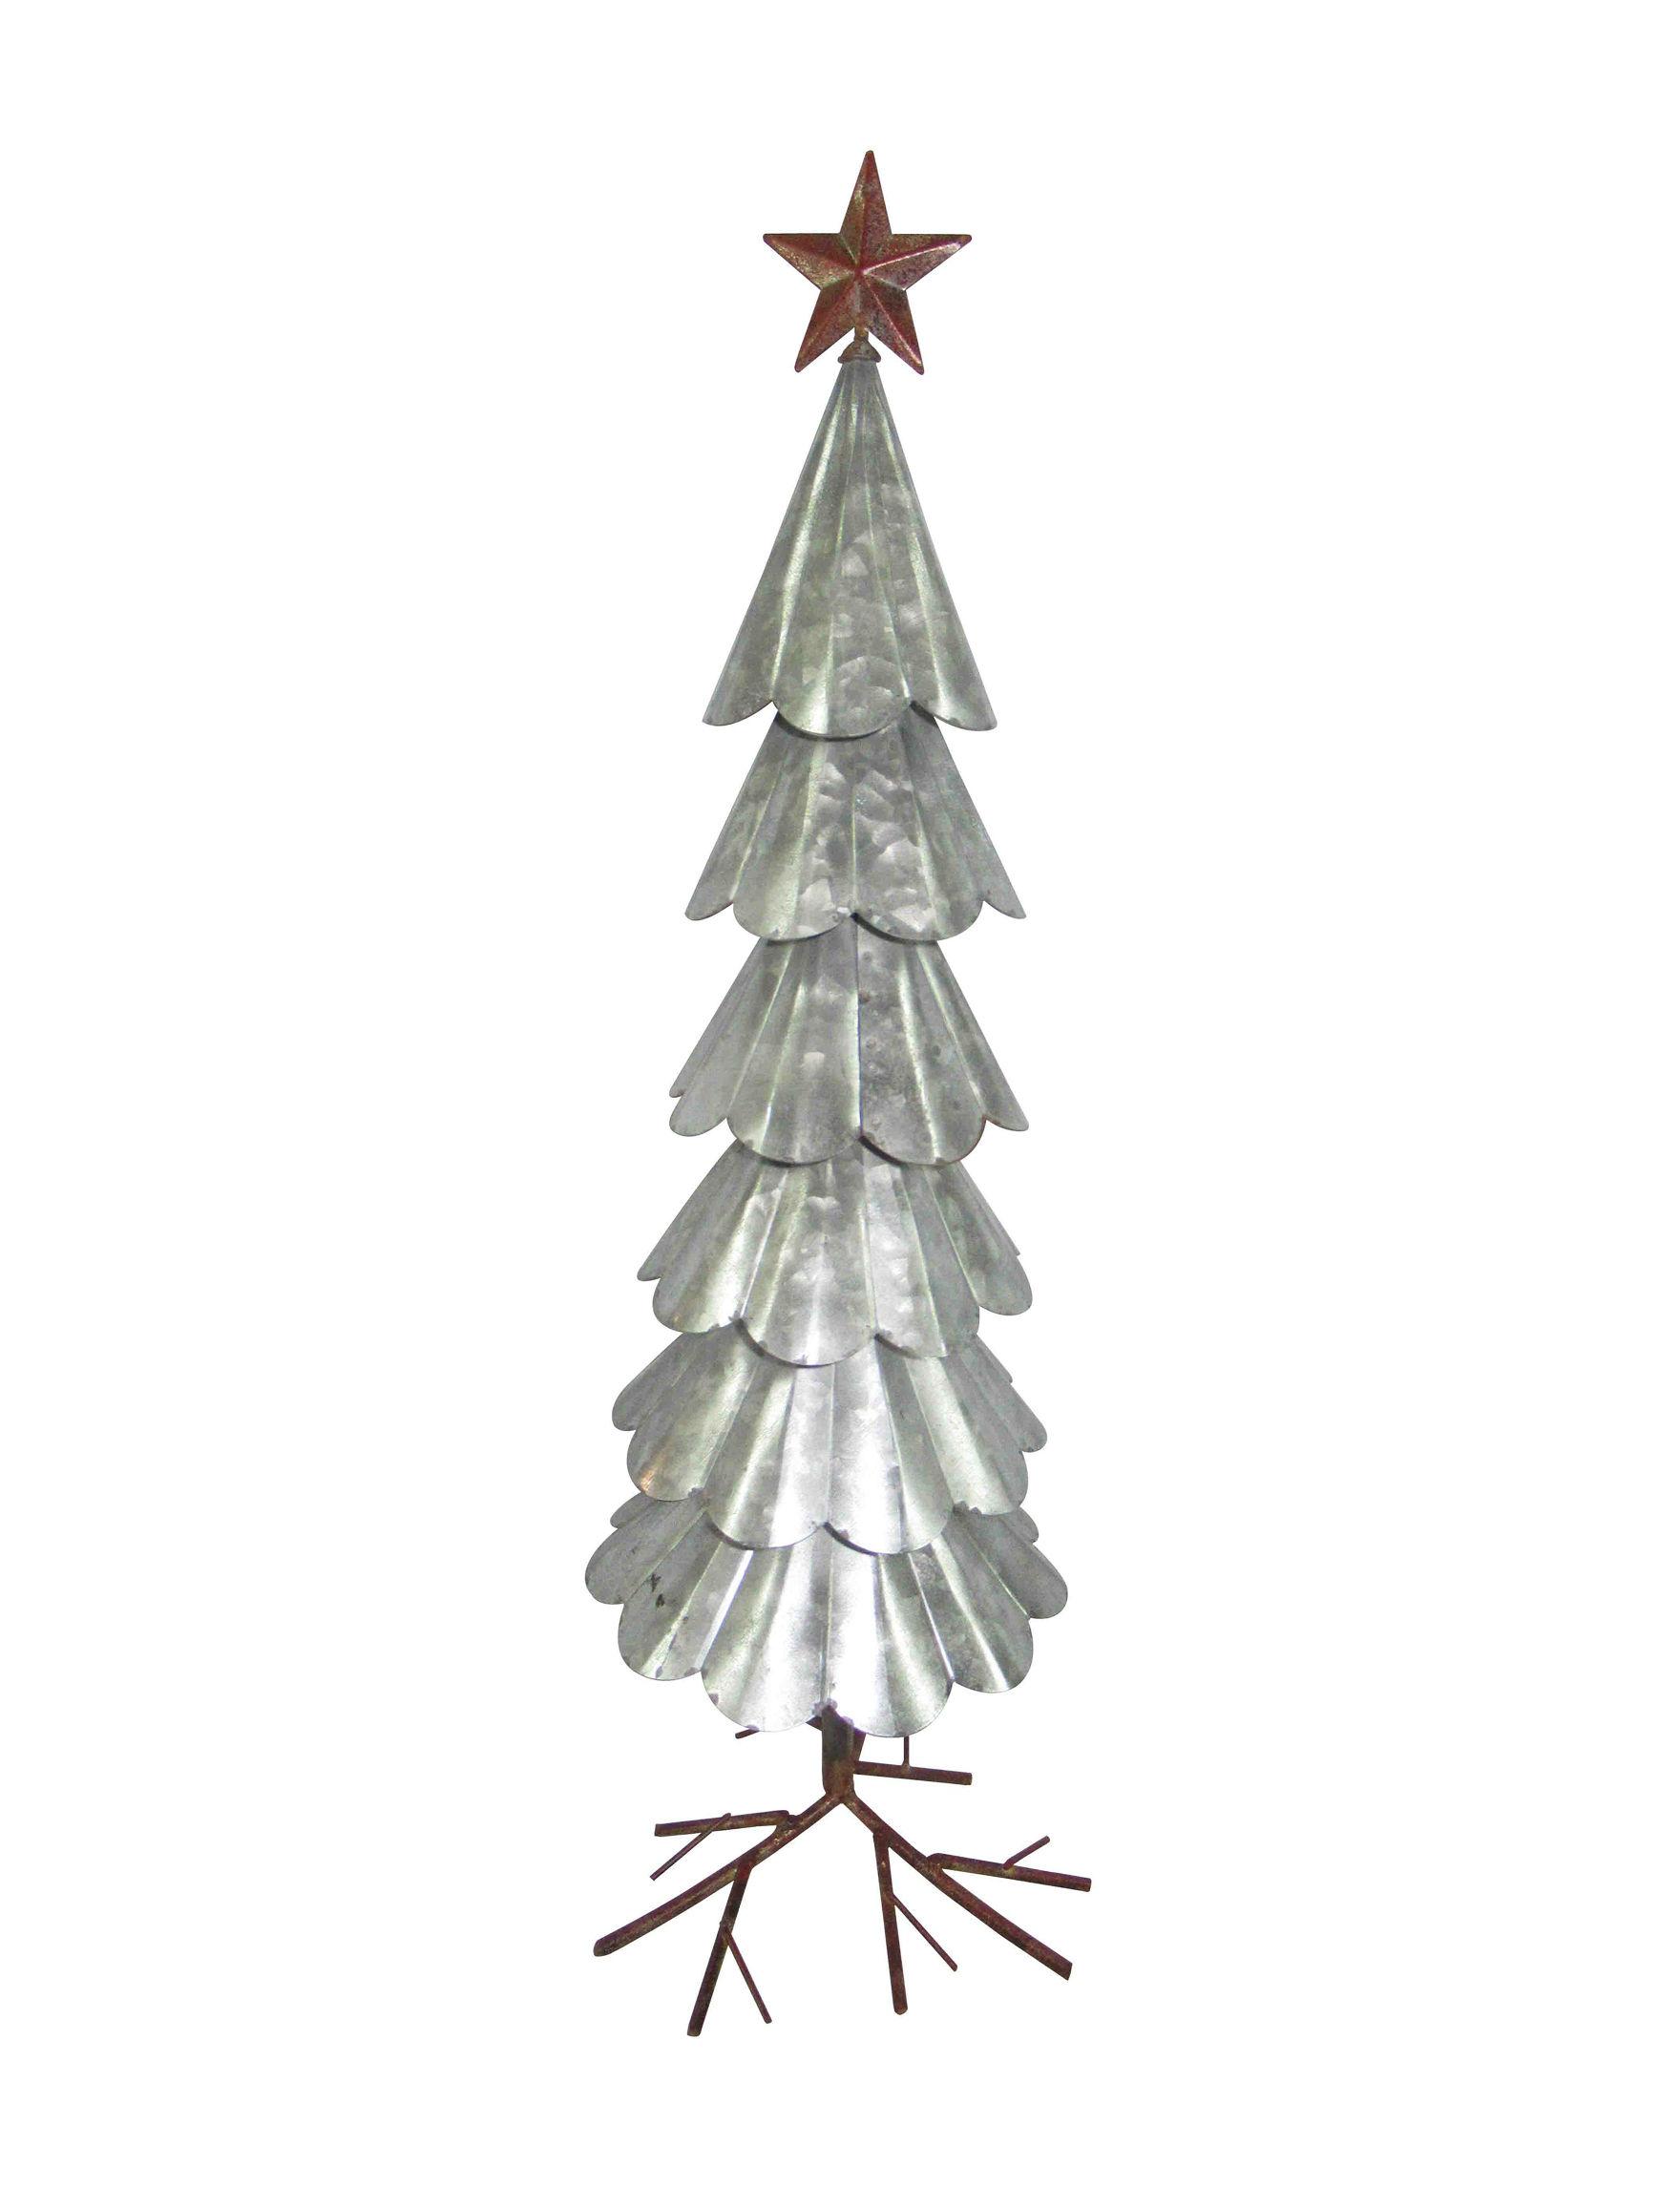 Novelty Trading Corp. Tin Christmas Trees Decorative Objects Holiday Decor